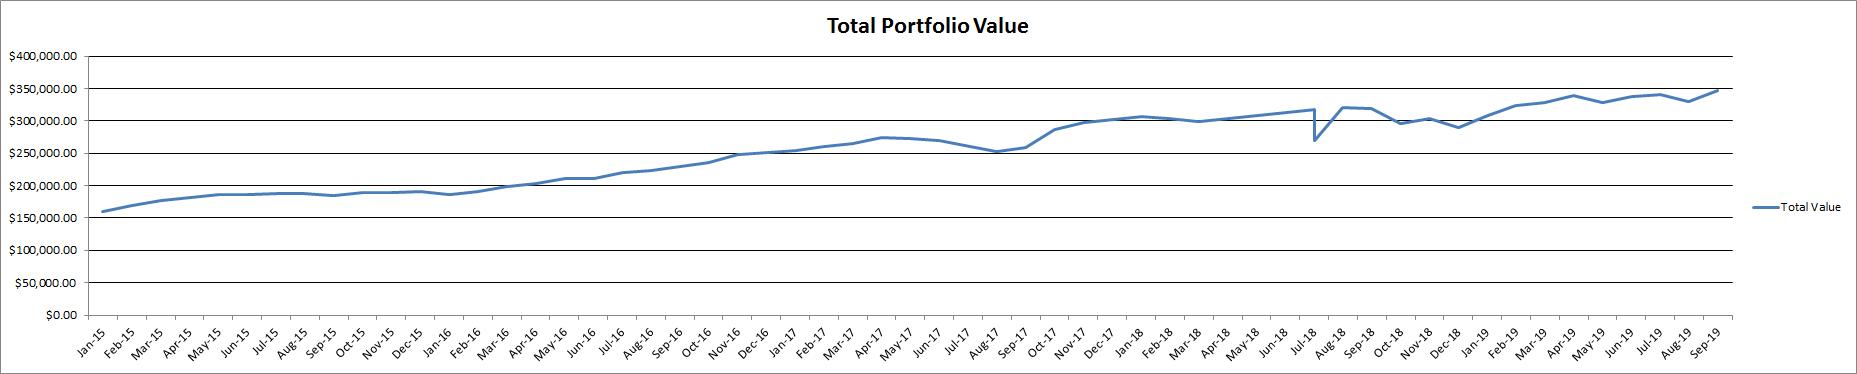 MoneyMaaster Stock Portfolio Total value